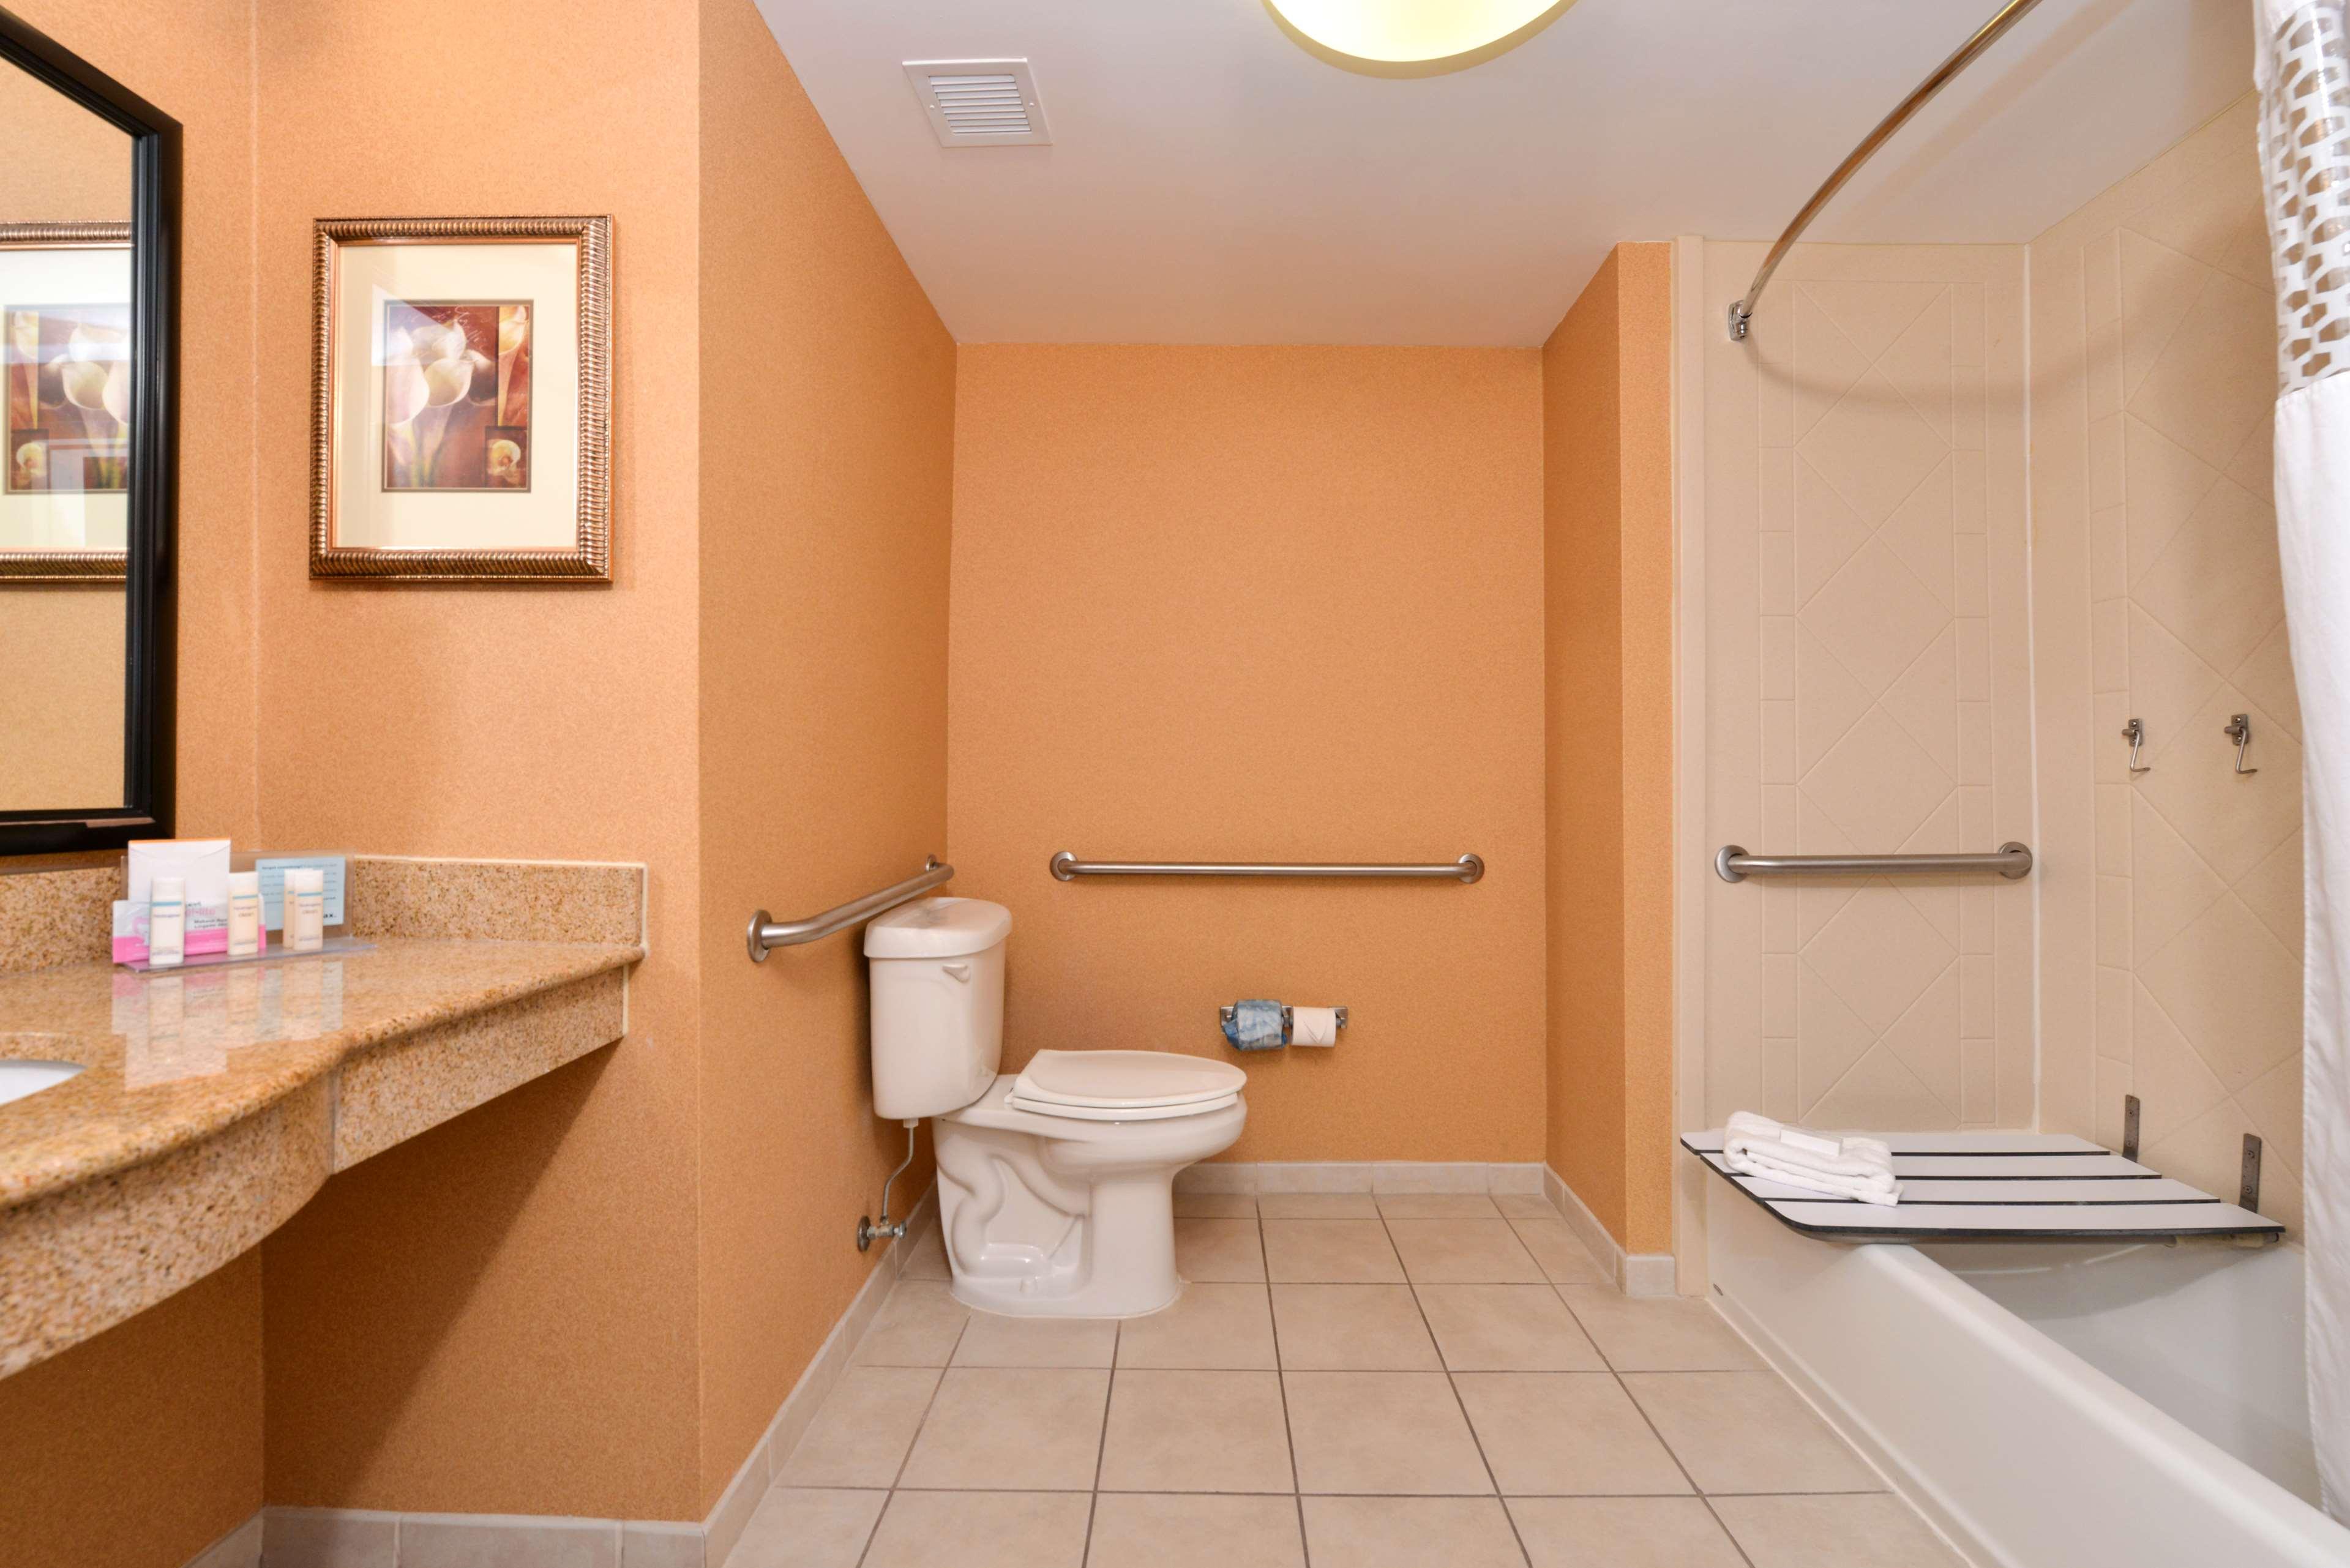 Hampton Inn & Suites Fredericksburg South image 30